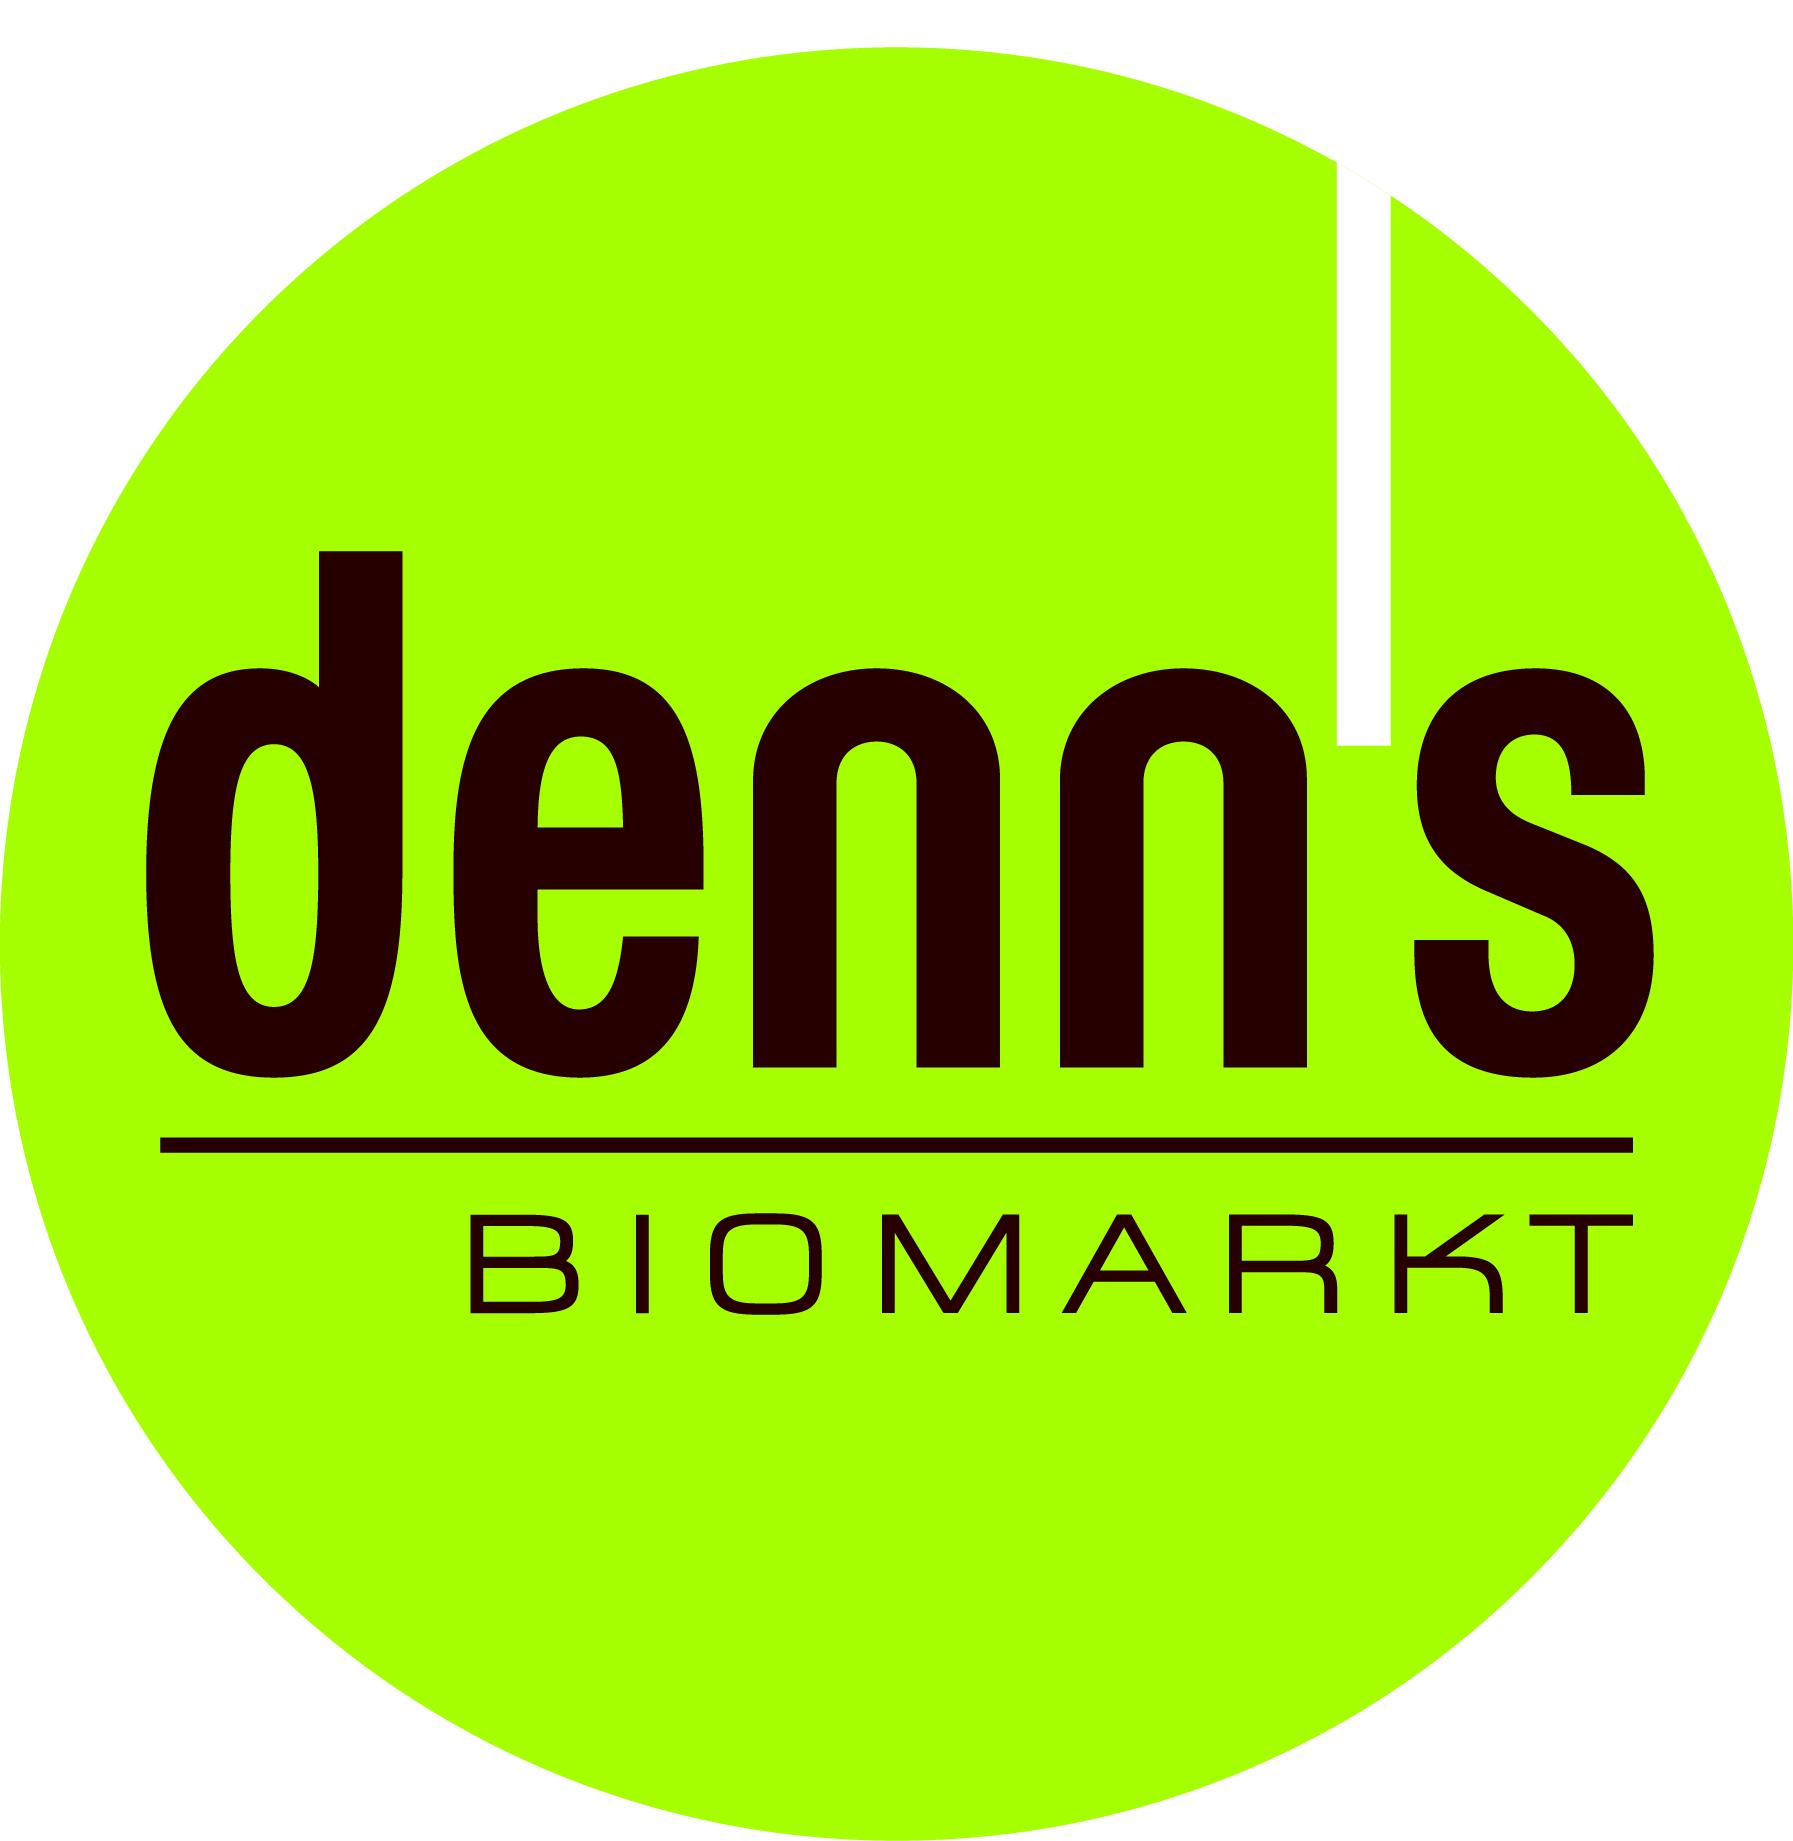 denns_logo_4c